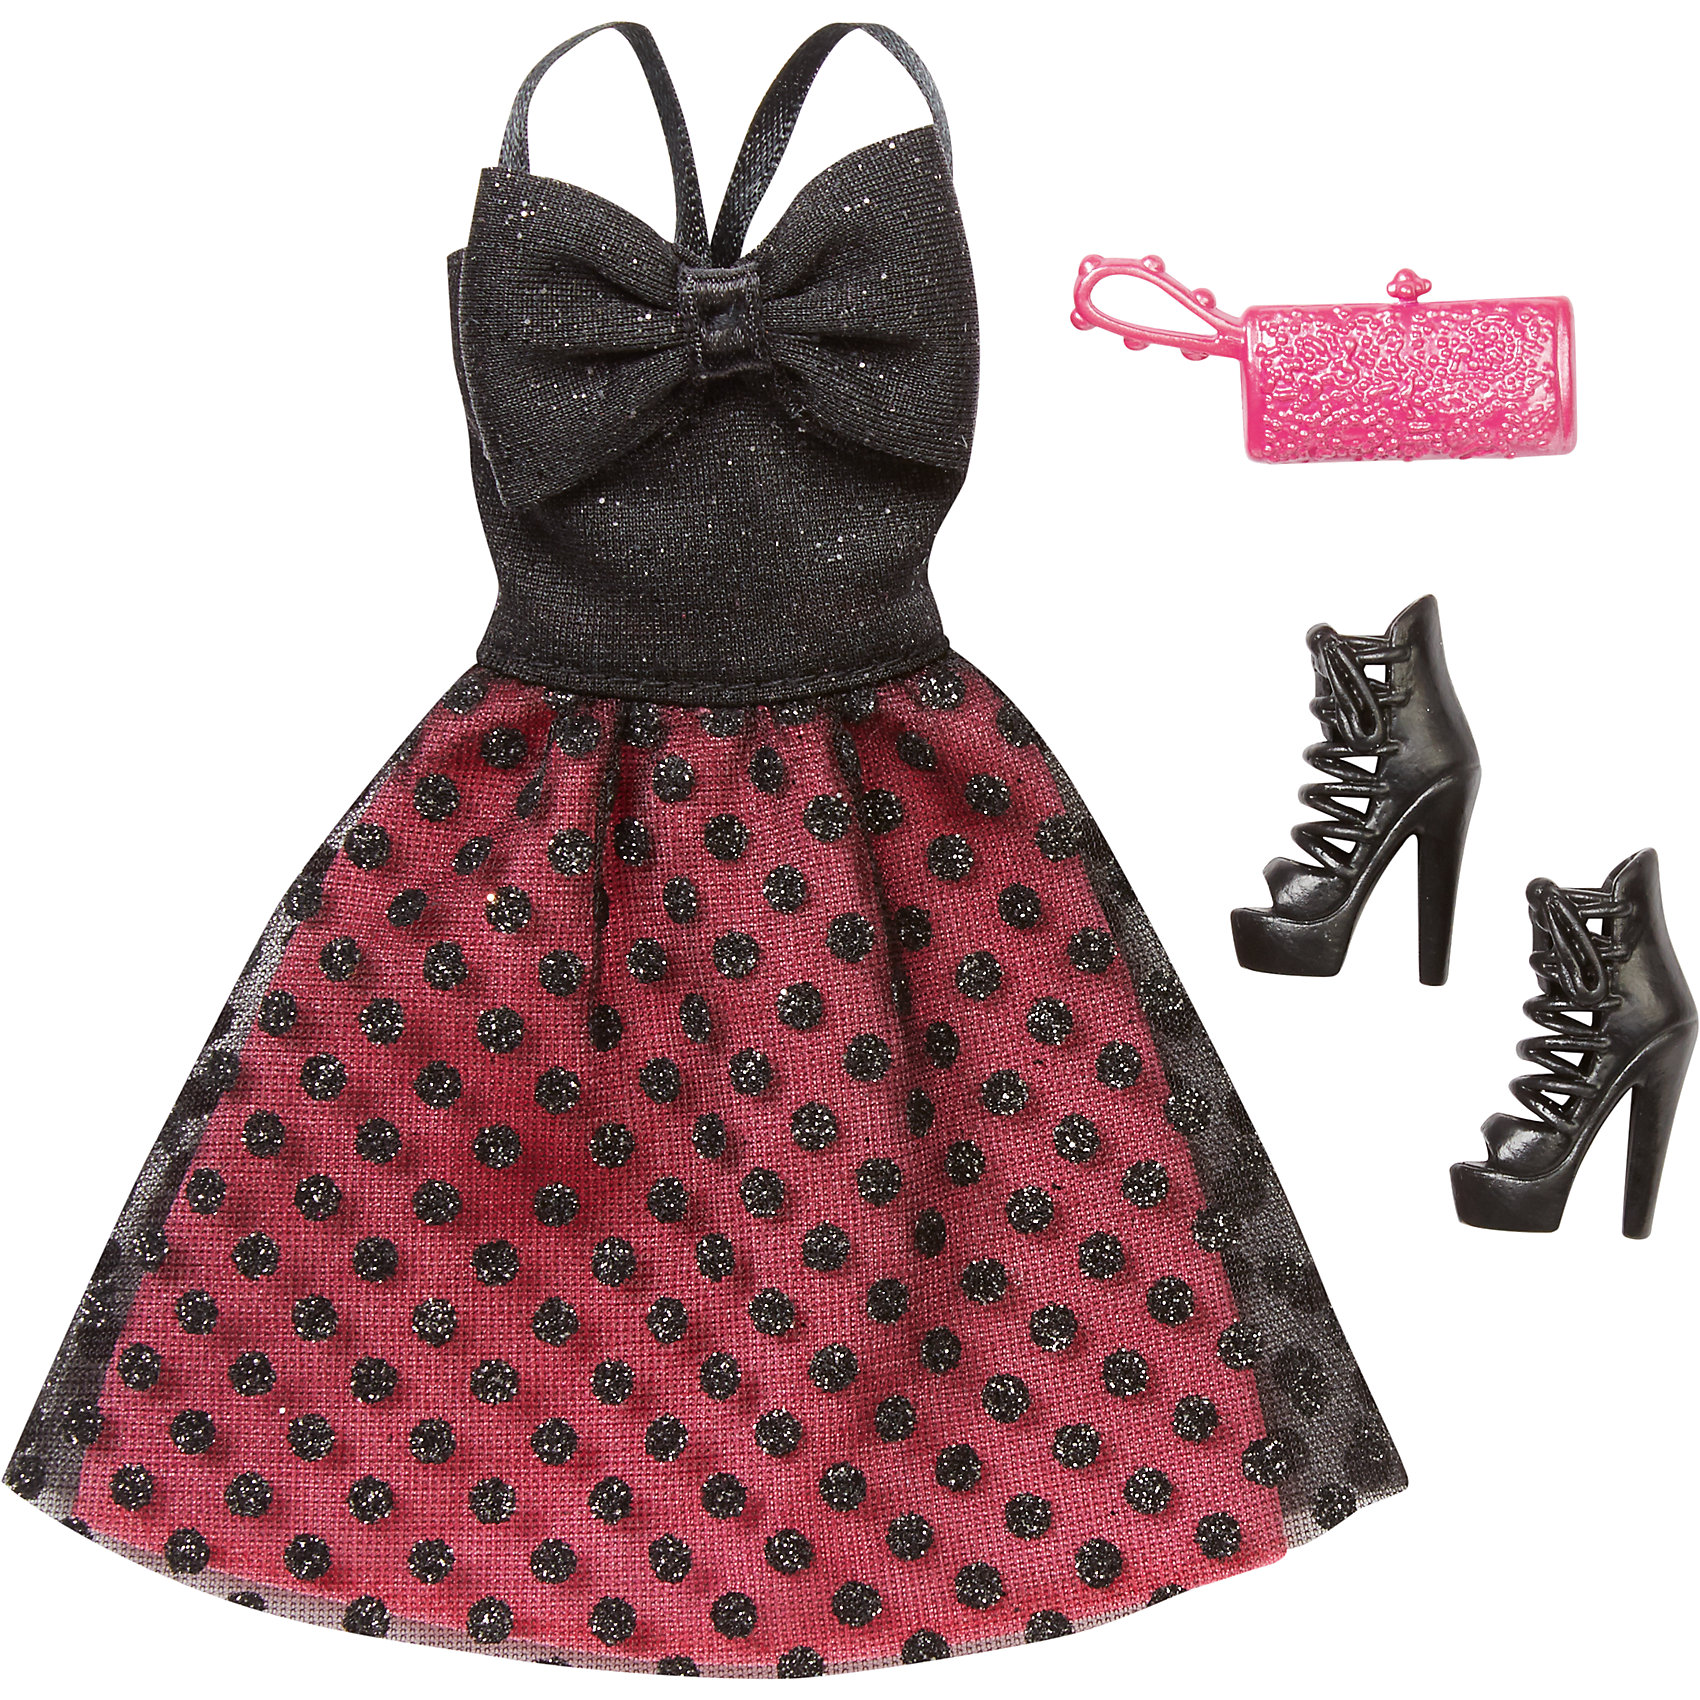 Mattel Комплект одежды, Barbie mattel mattel кукла ever after high мишель мермейд